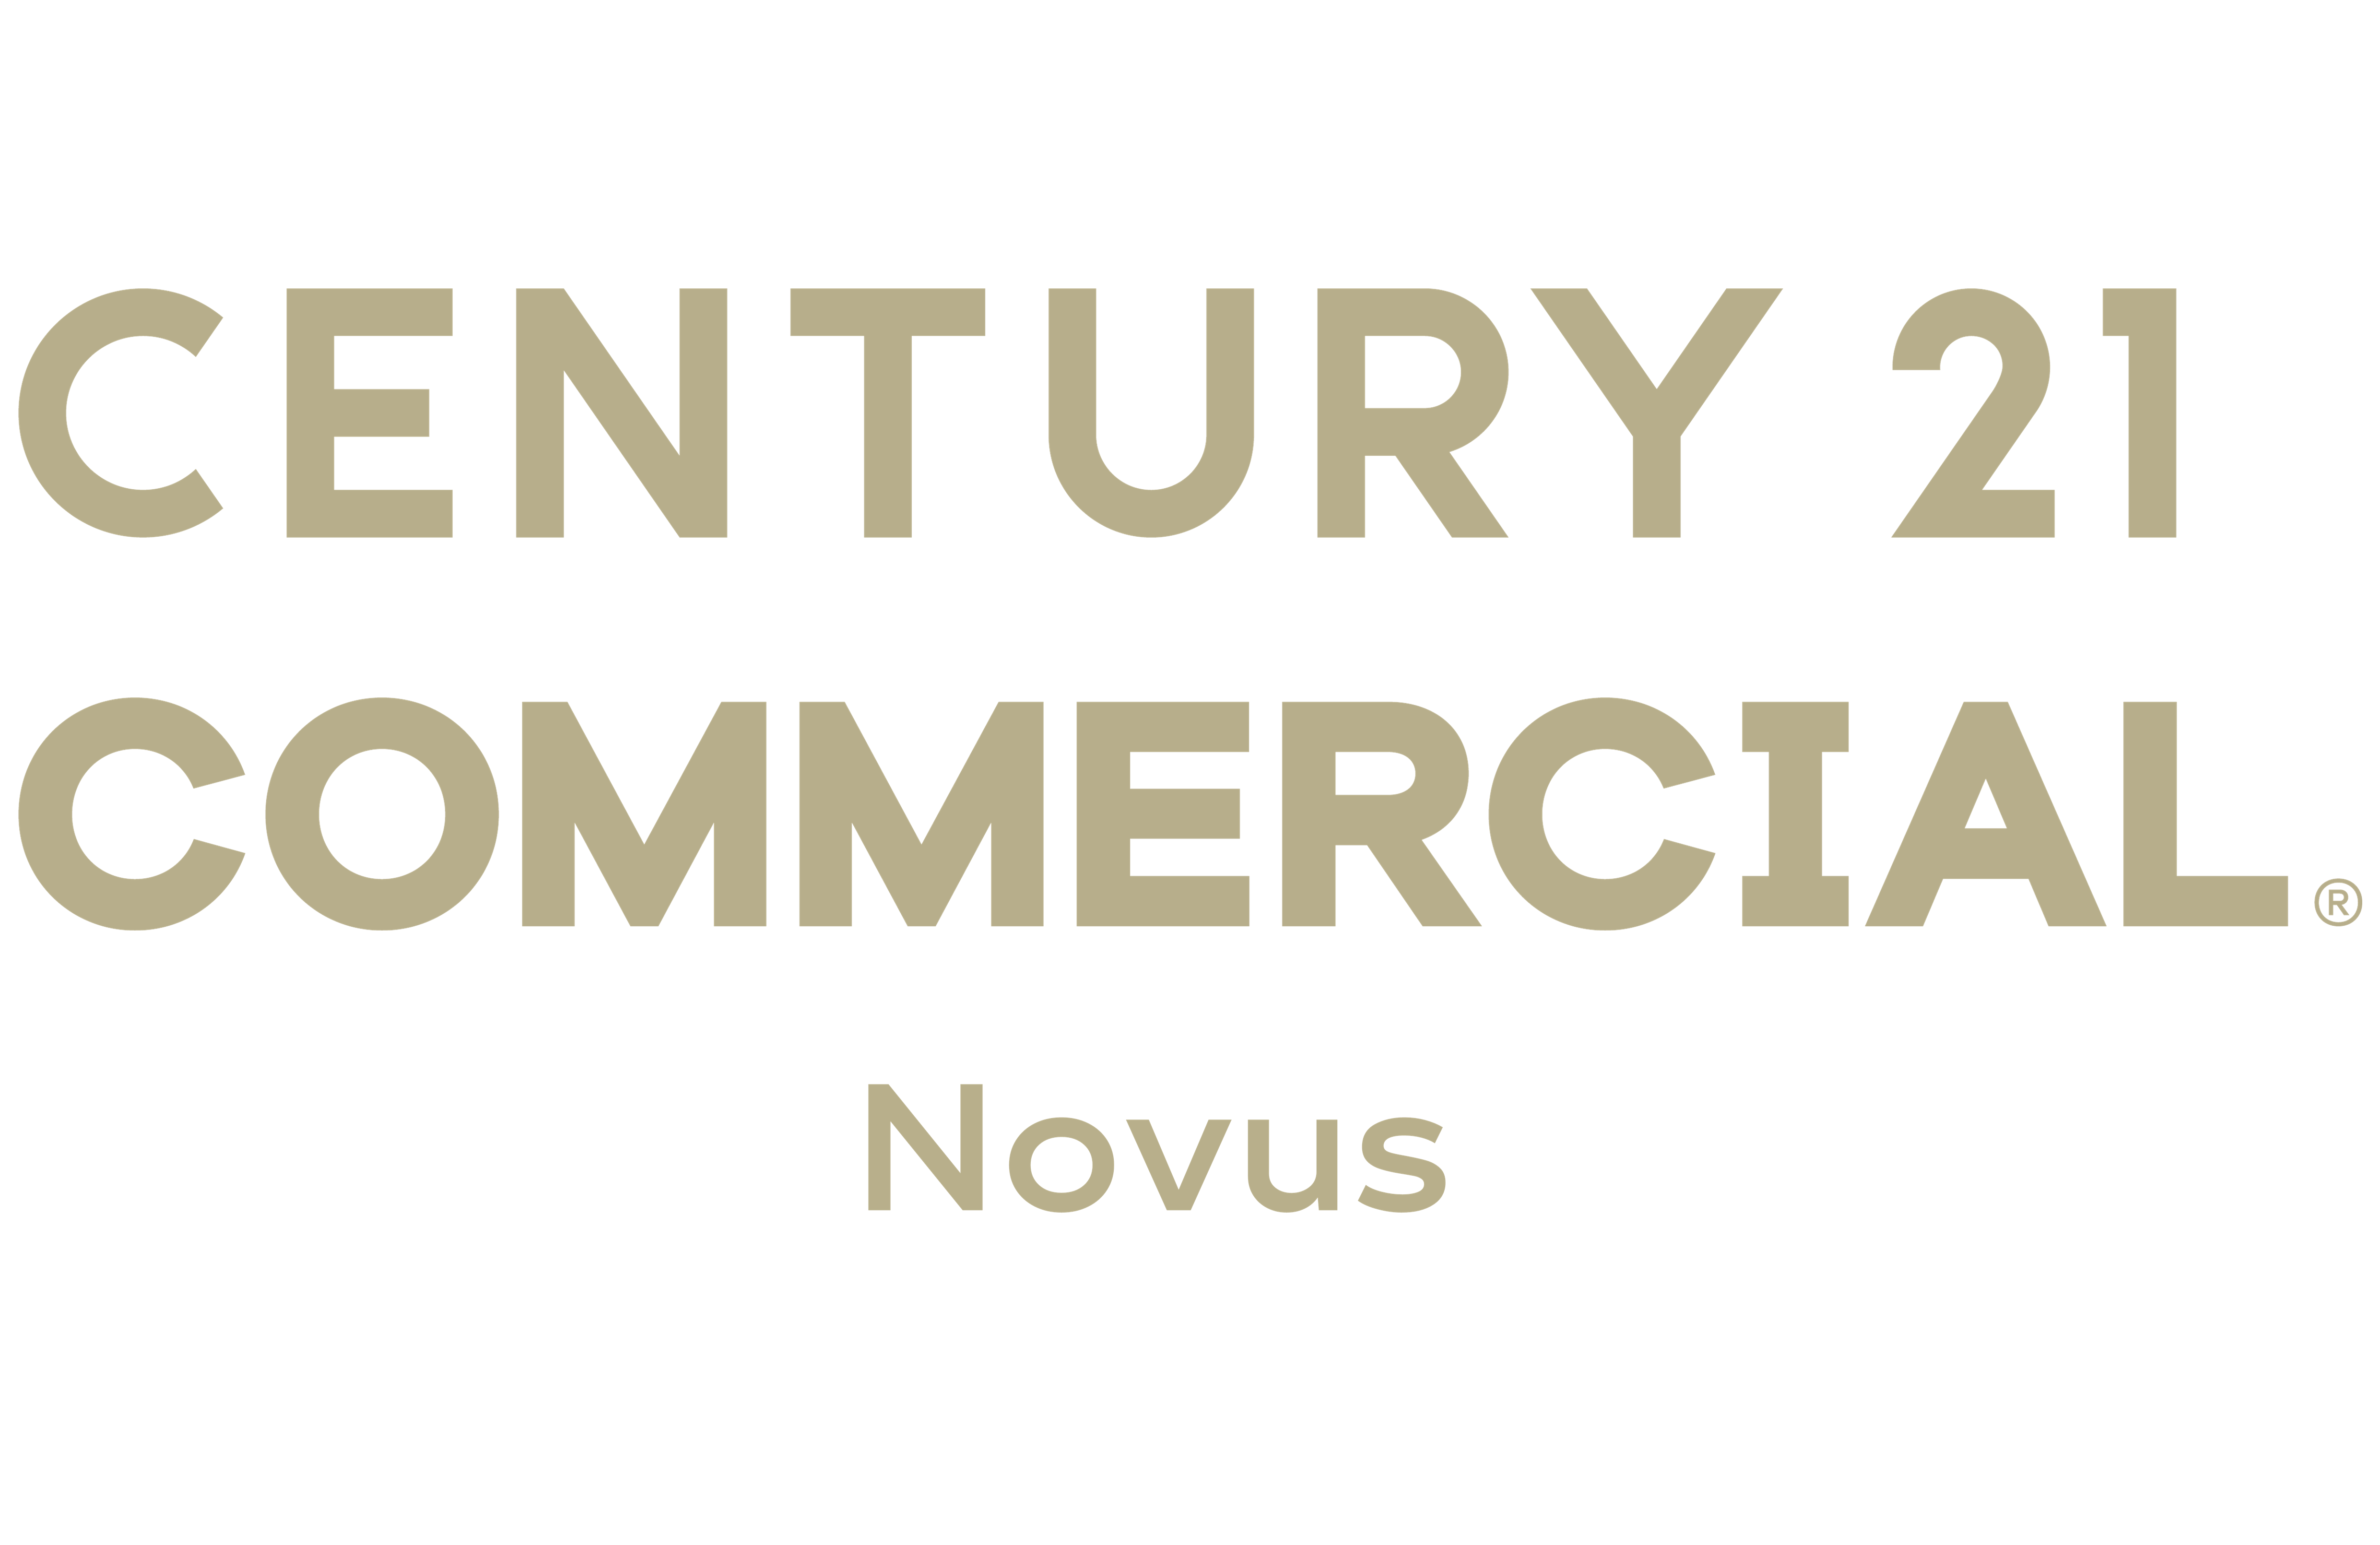 Novus Commercial